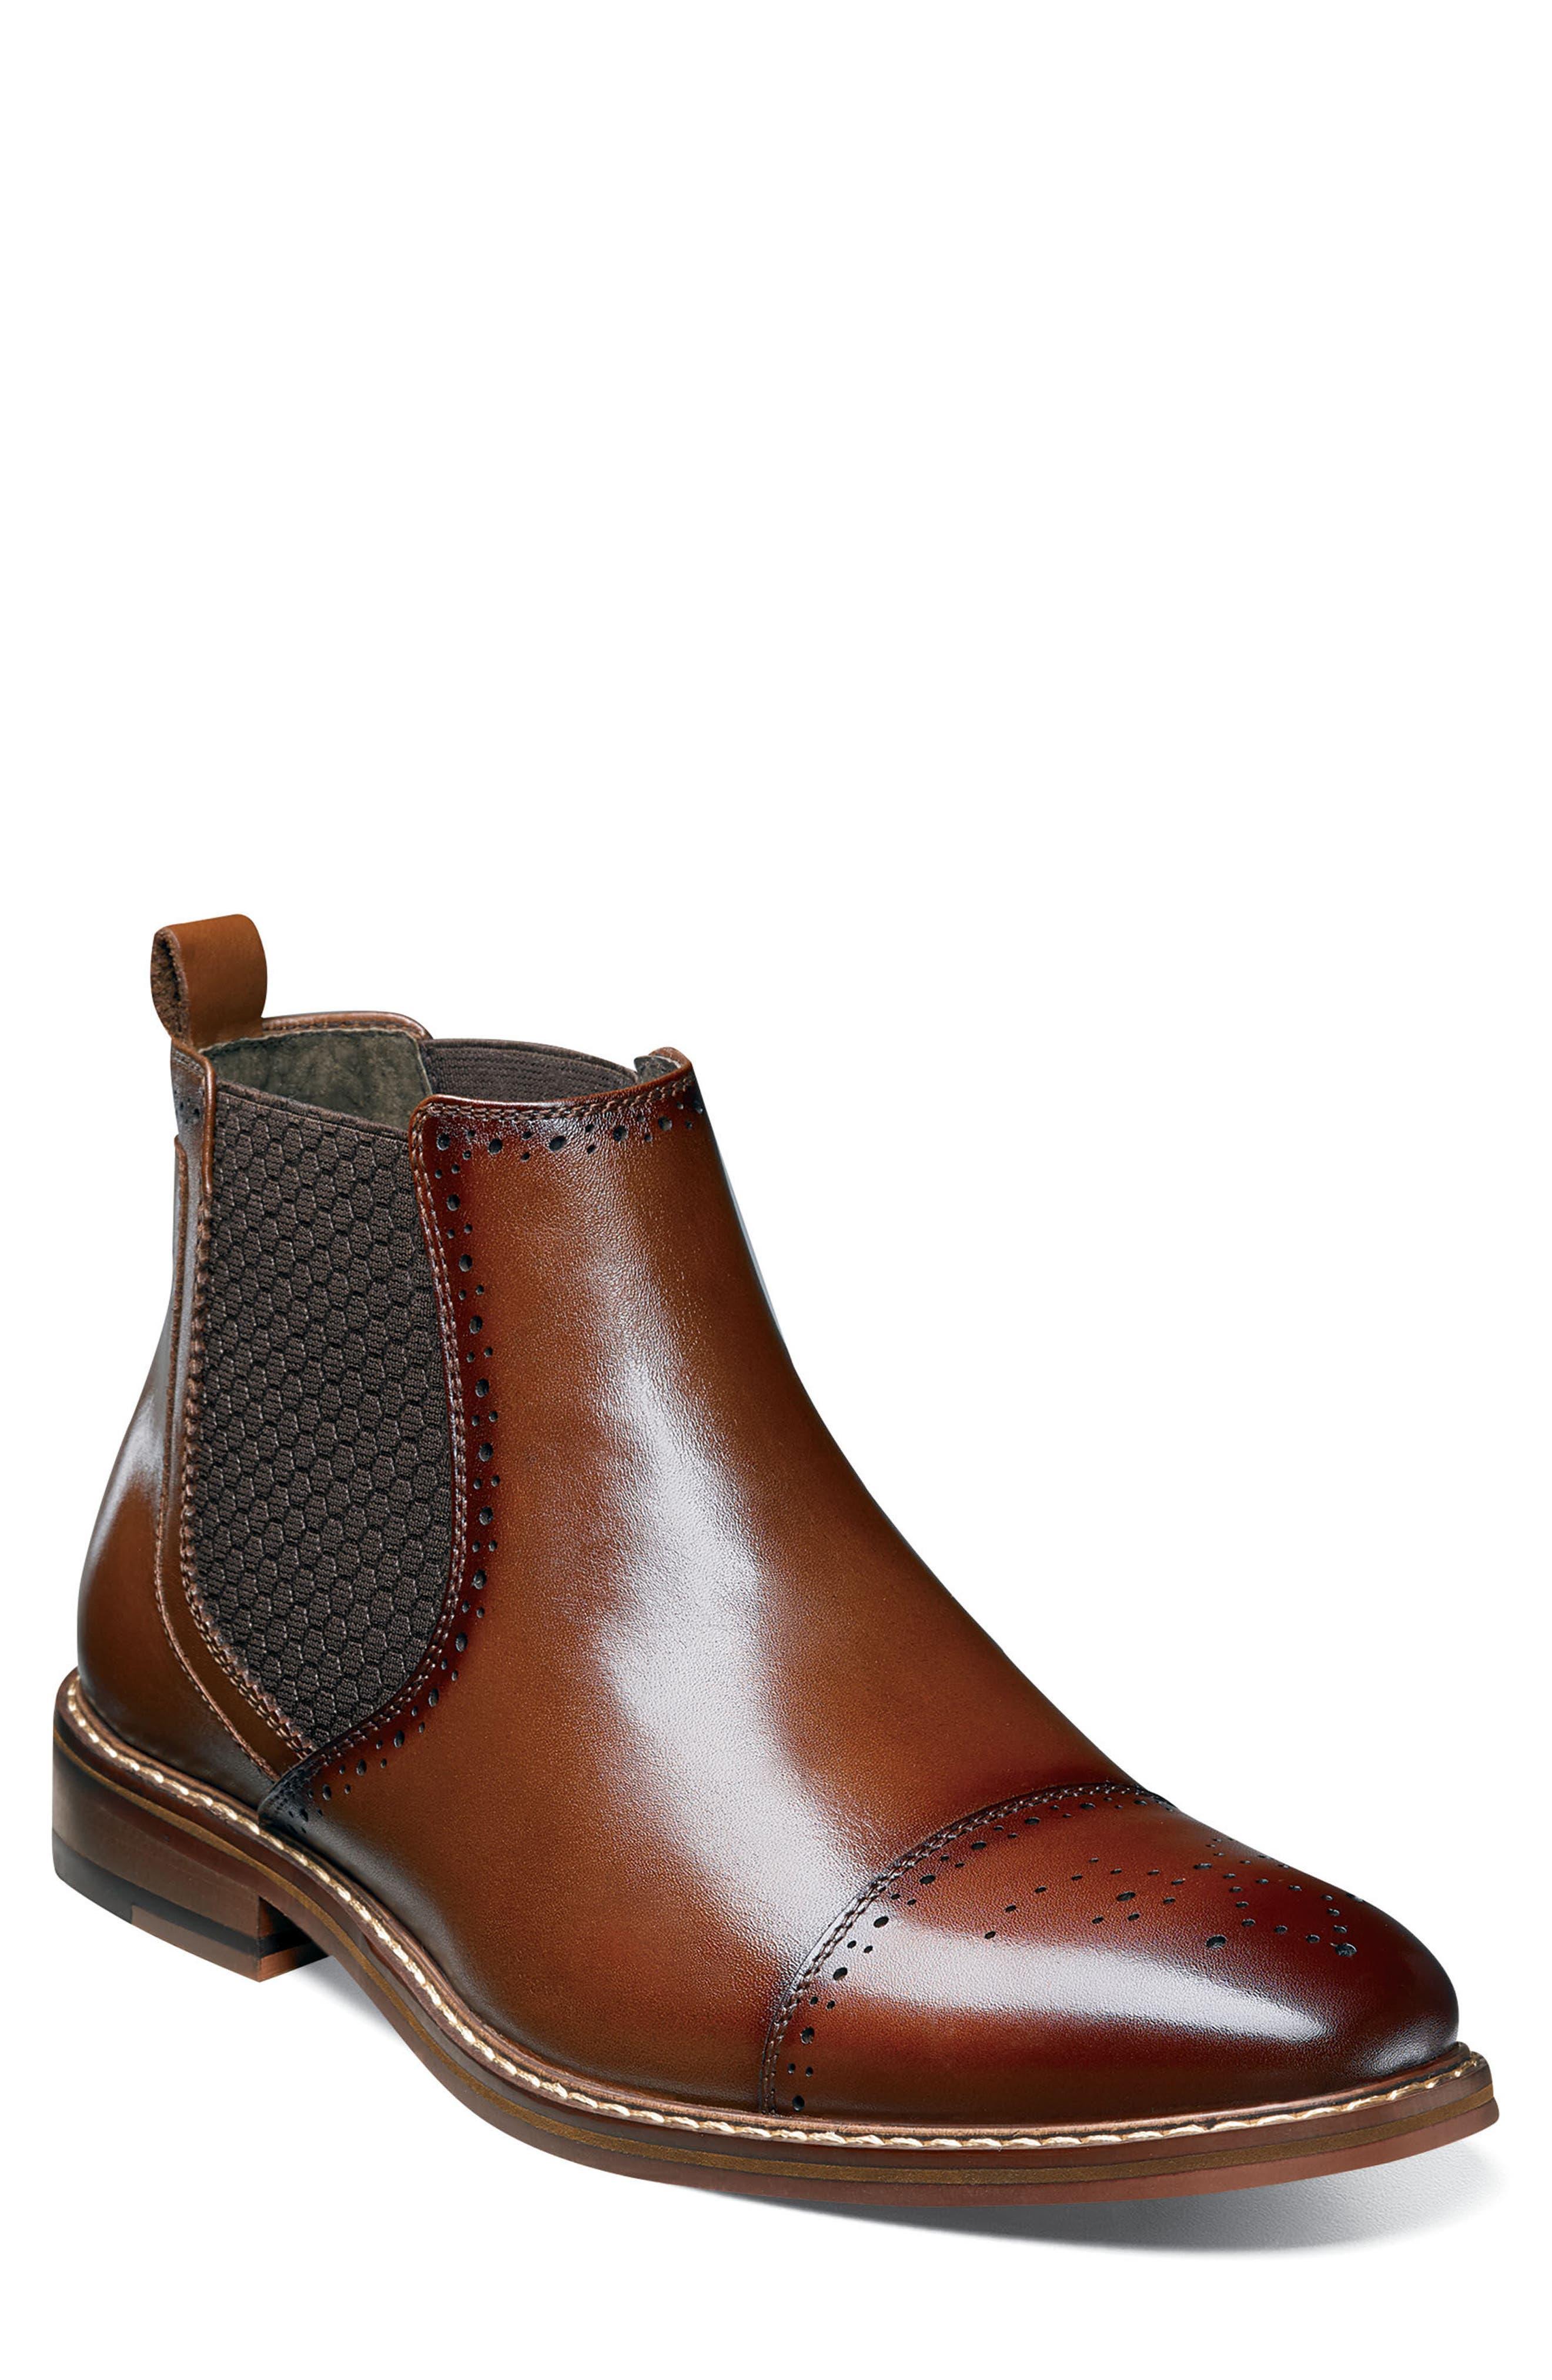 Alomar Chelsea Boot,                         Main,                         color, Cognac Leather